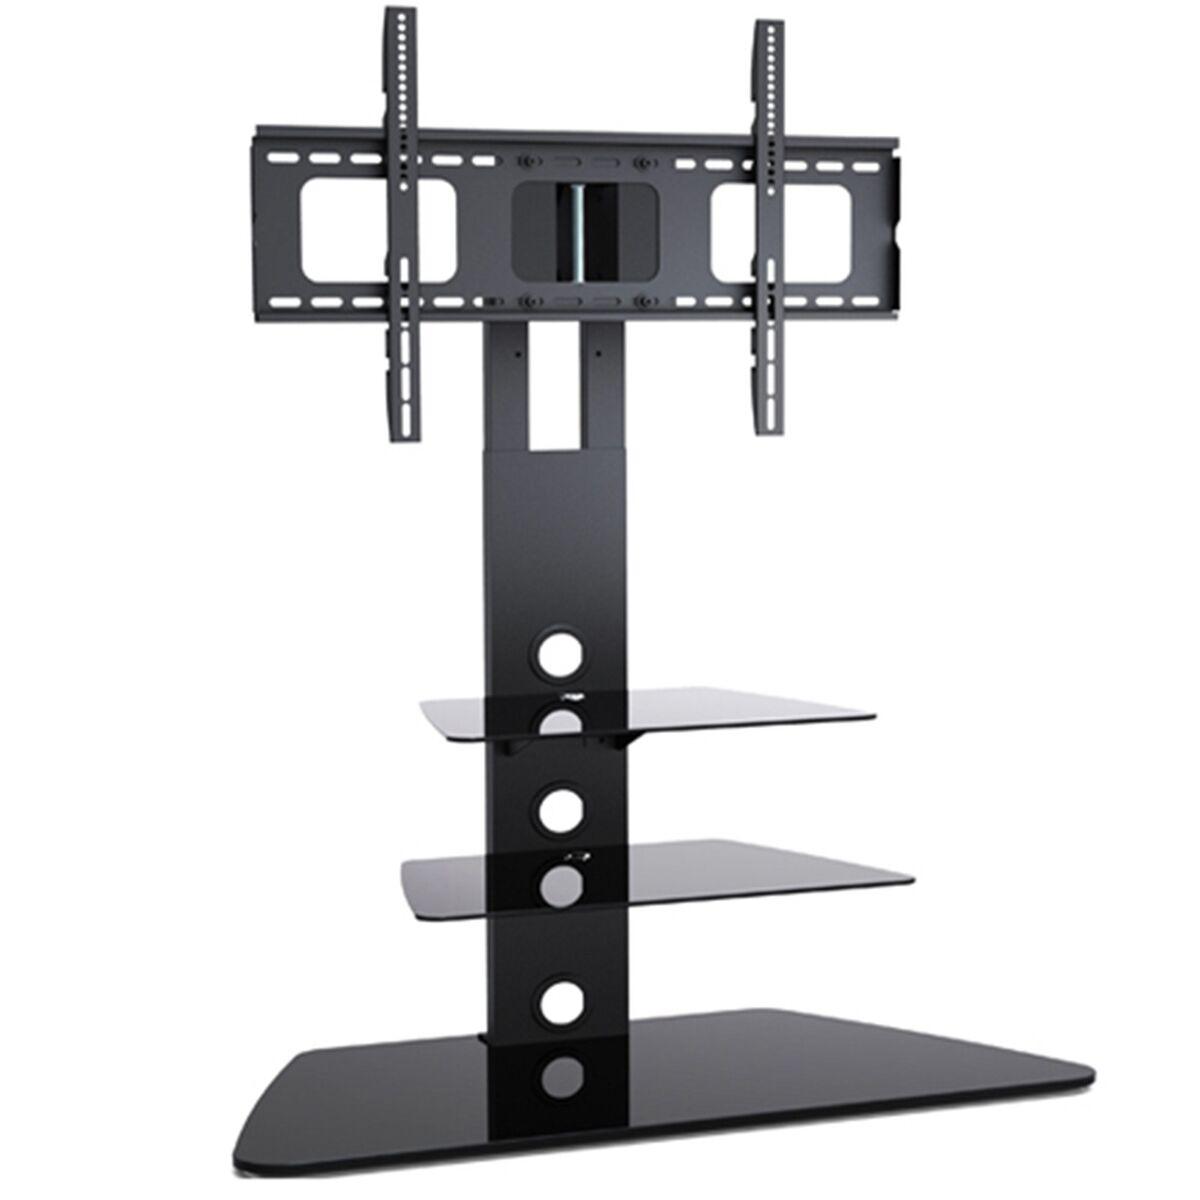 Modern 3 Shelf Tier Black Glass Tv Stand Mount 42 50 55 70 Inch